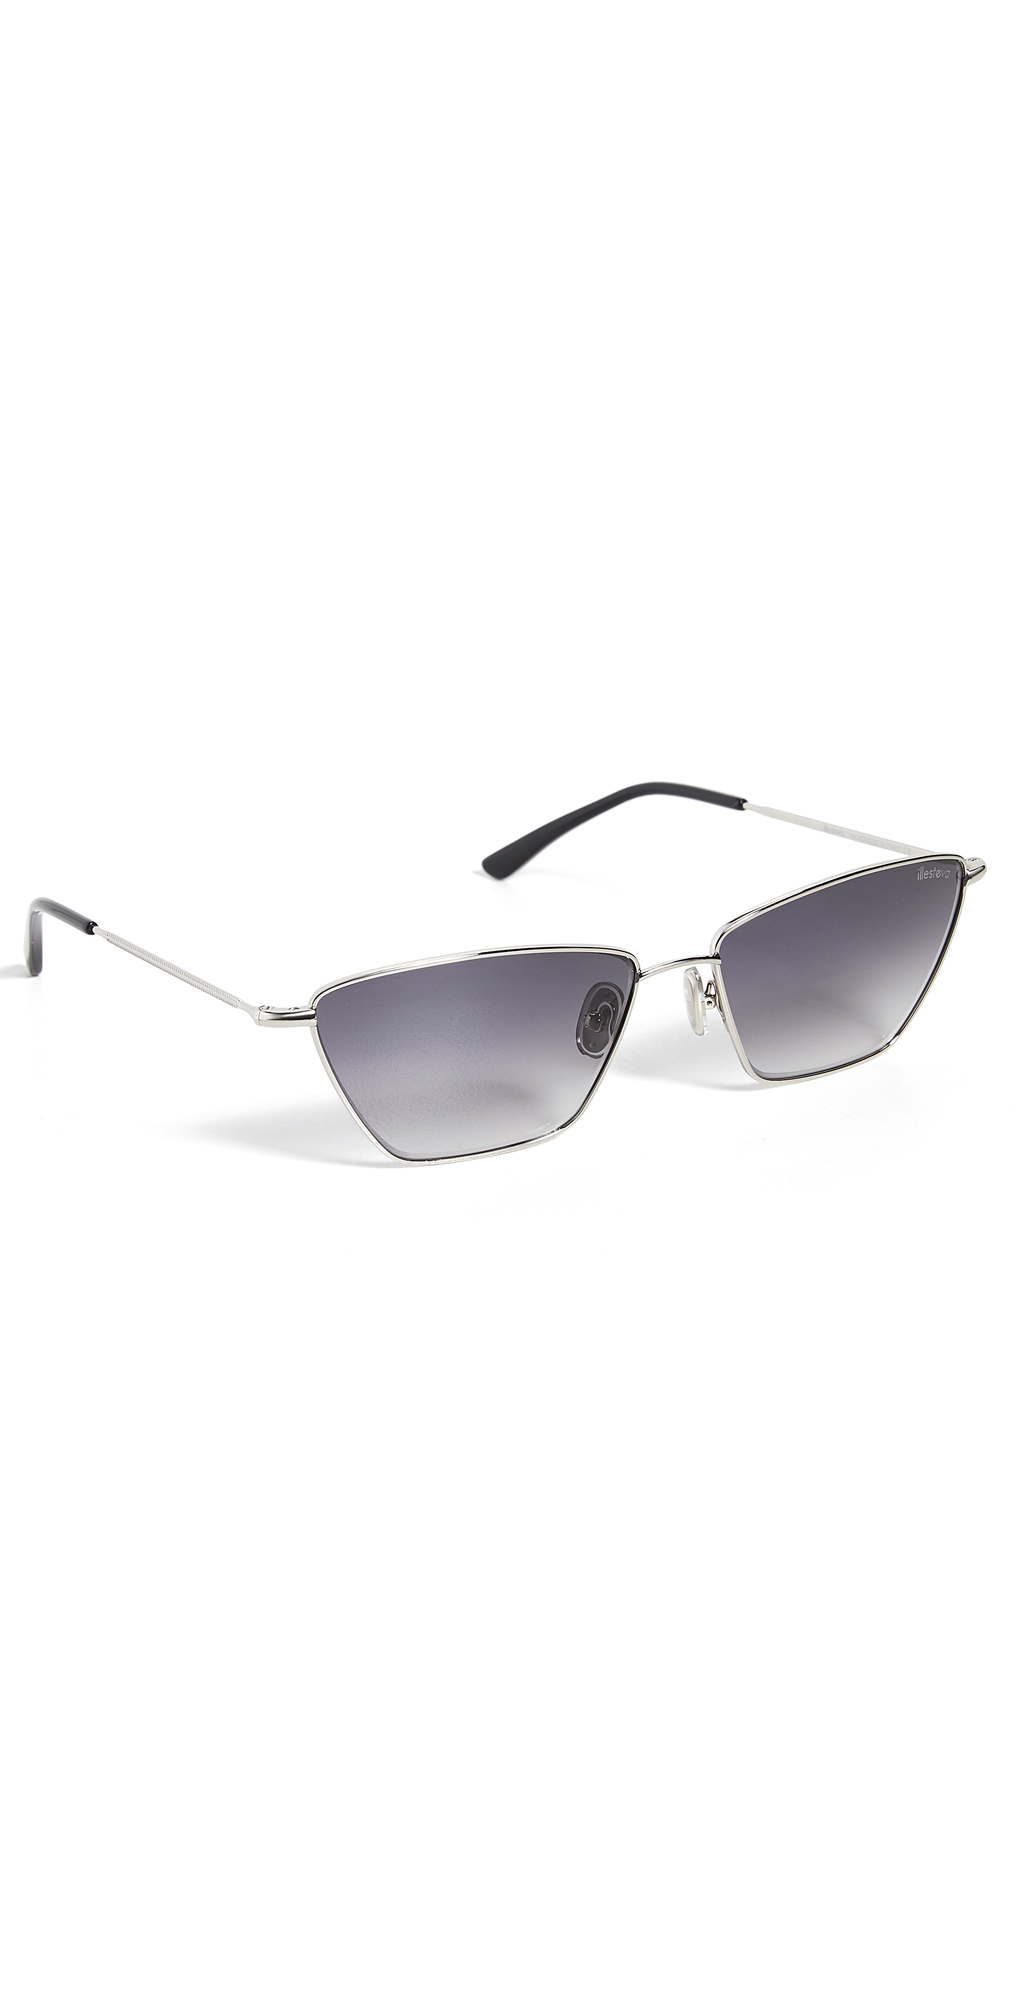 Lima Silver w/ Grey Gradient Lenses